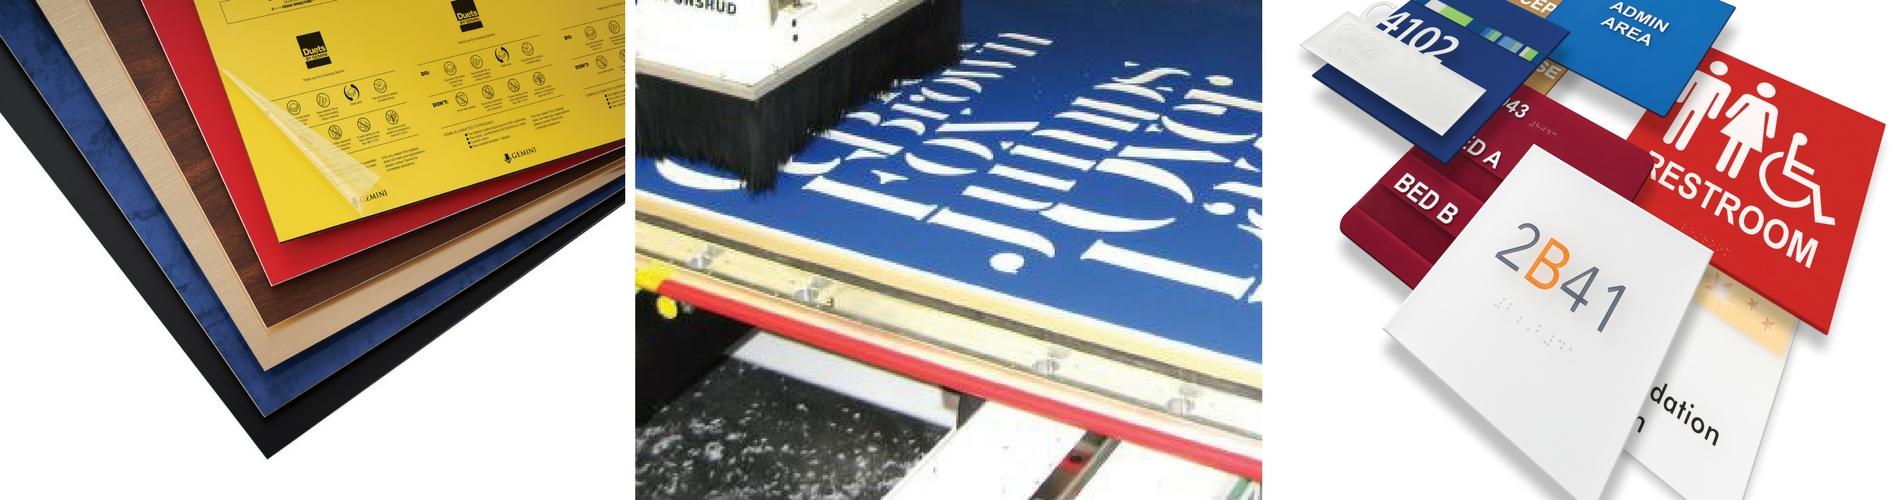 engraving plastic